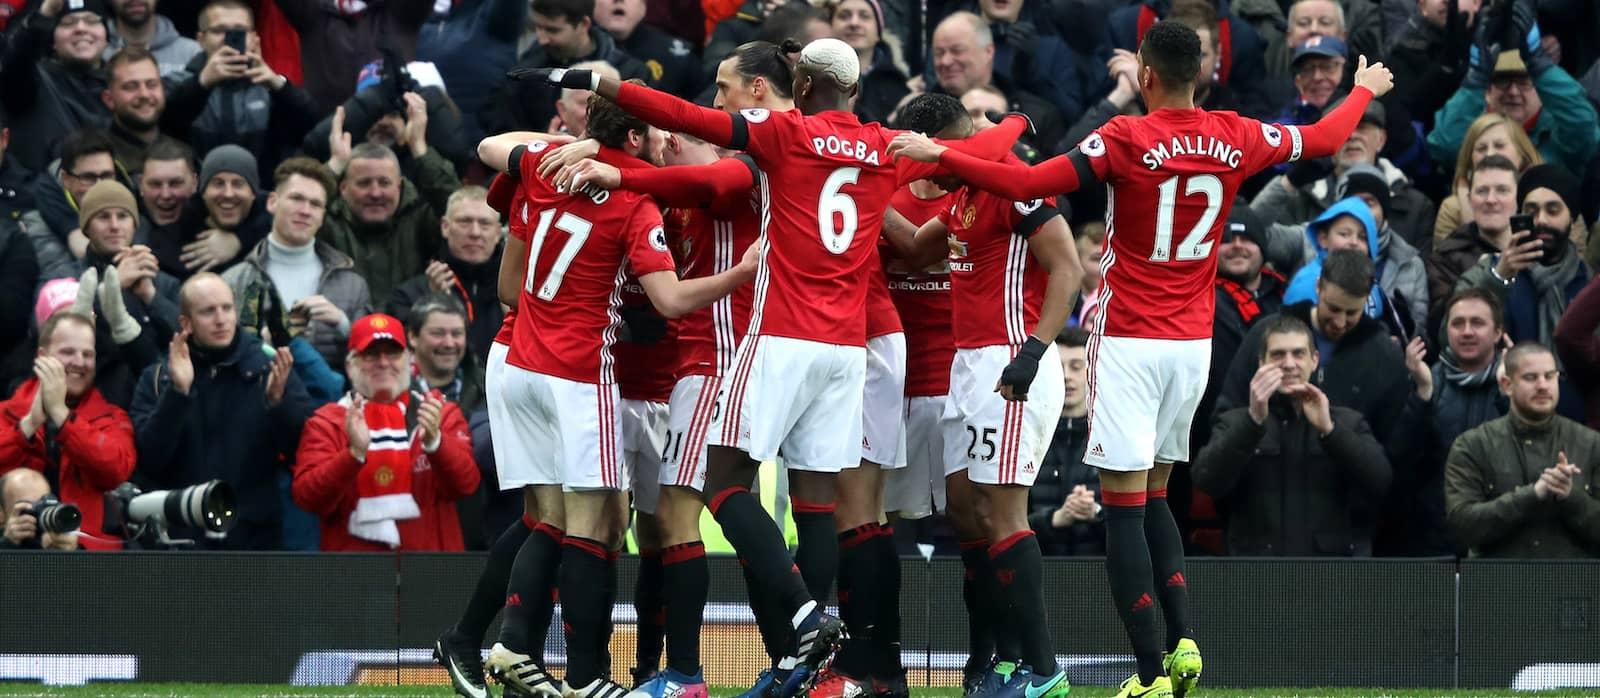 Prediksi Manchester United vs Saint Etienne